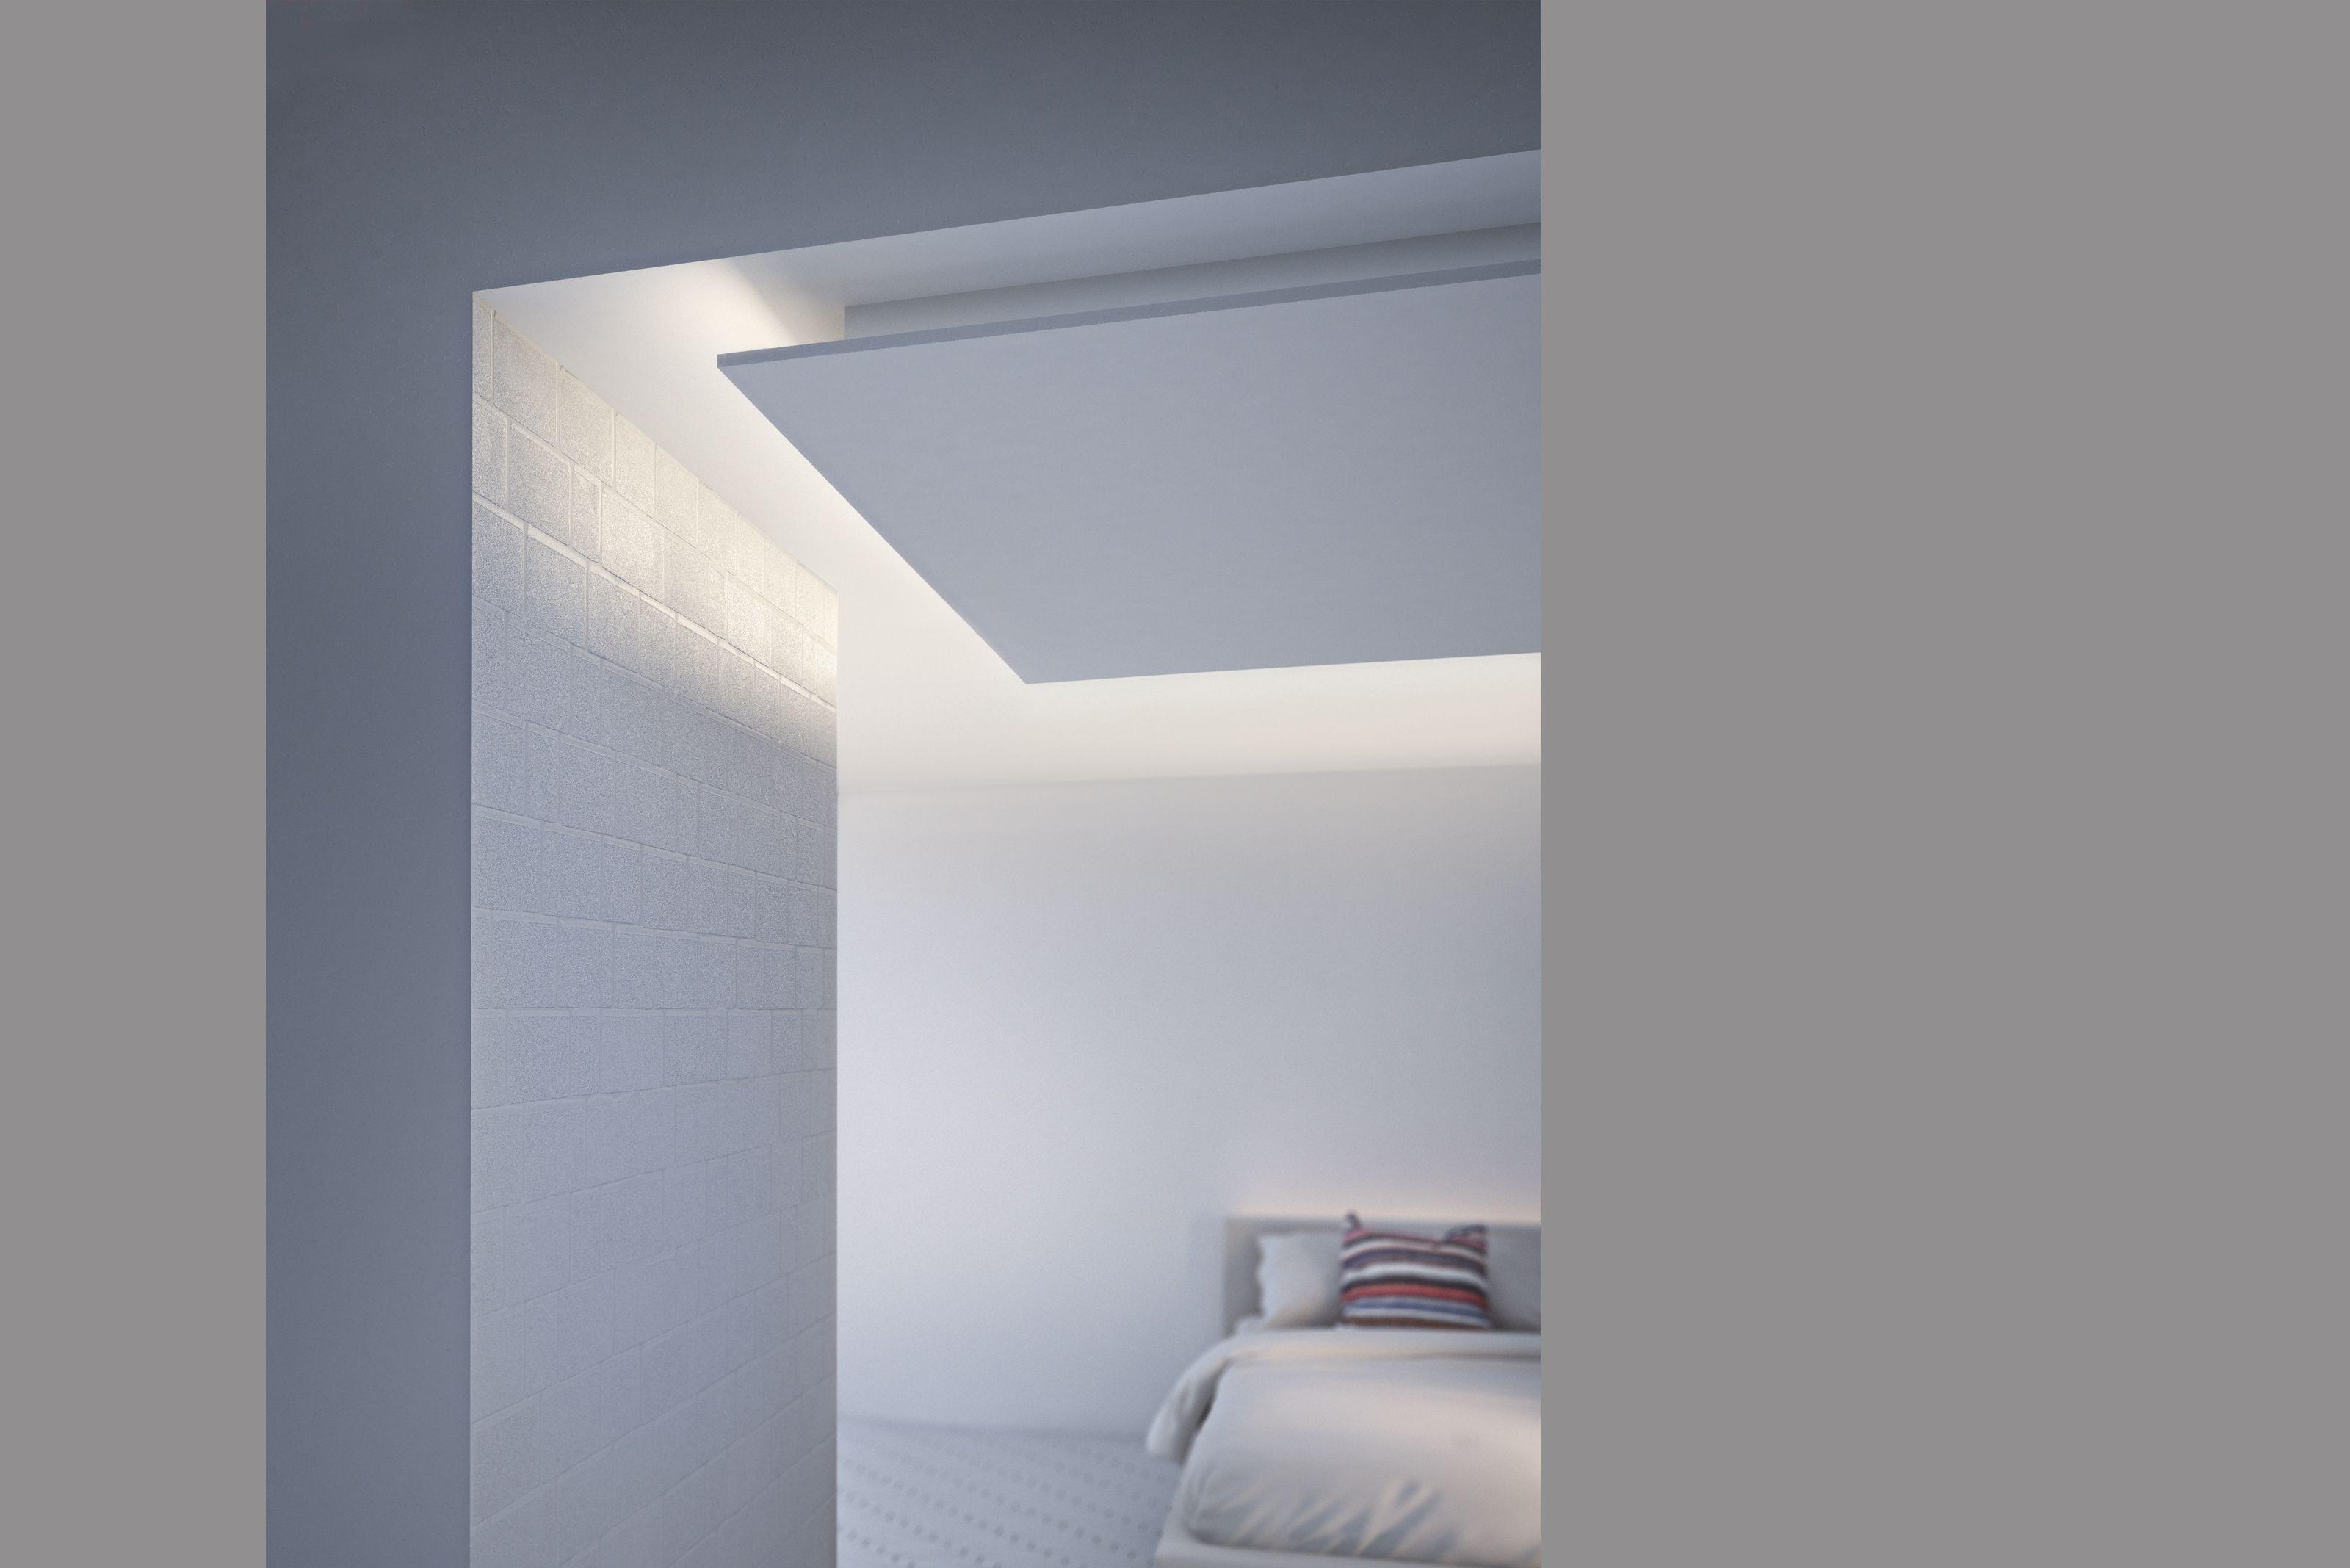 lightline-cala-f-3-mj-lighting-v2